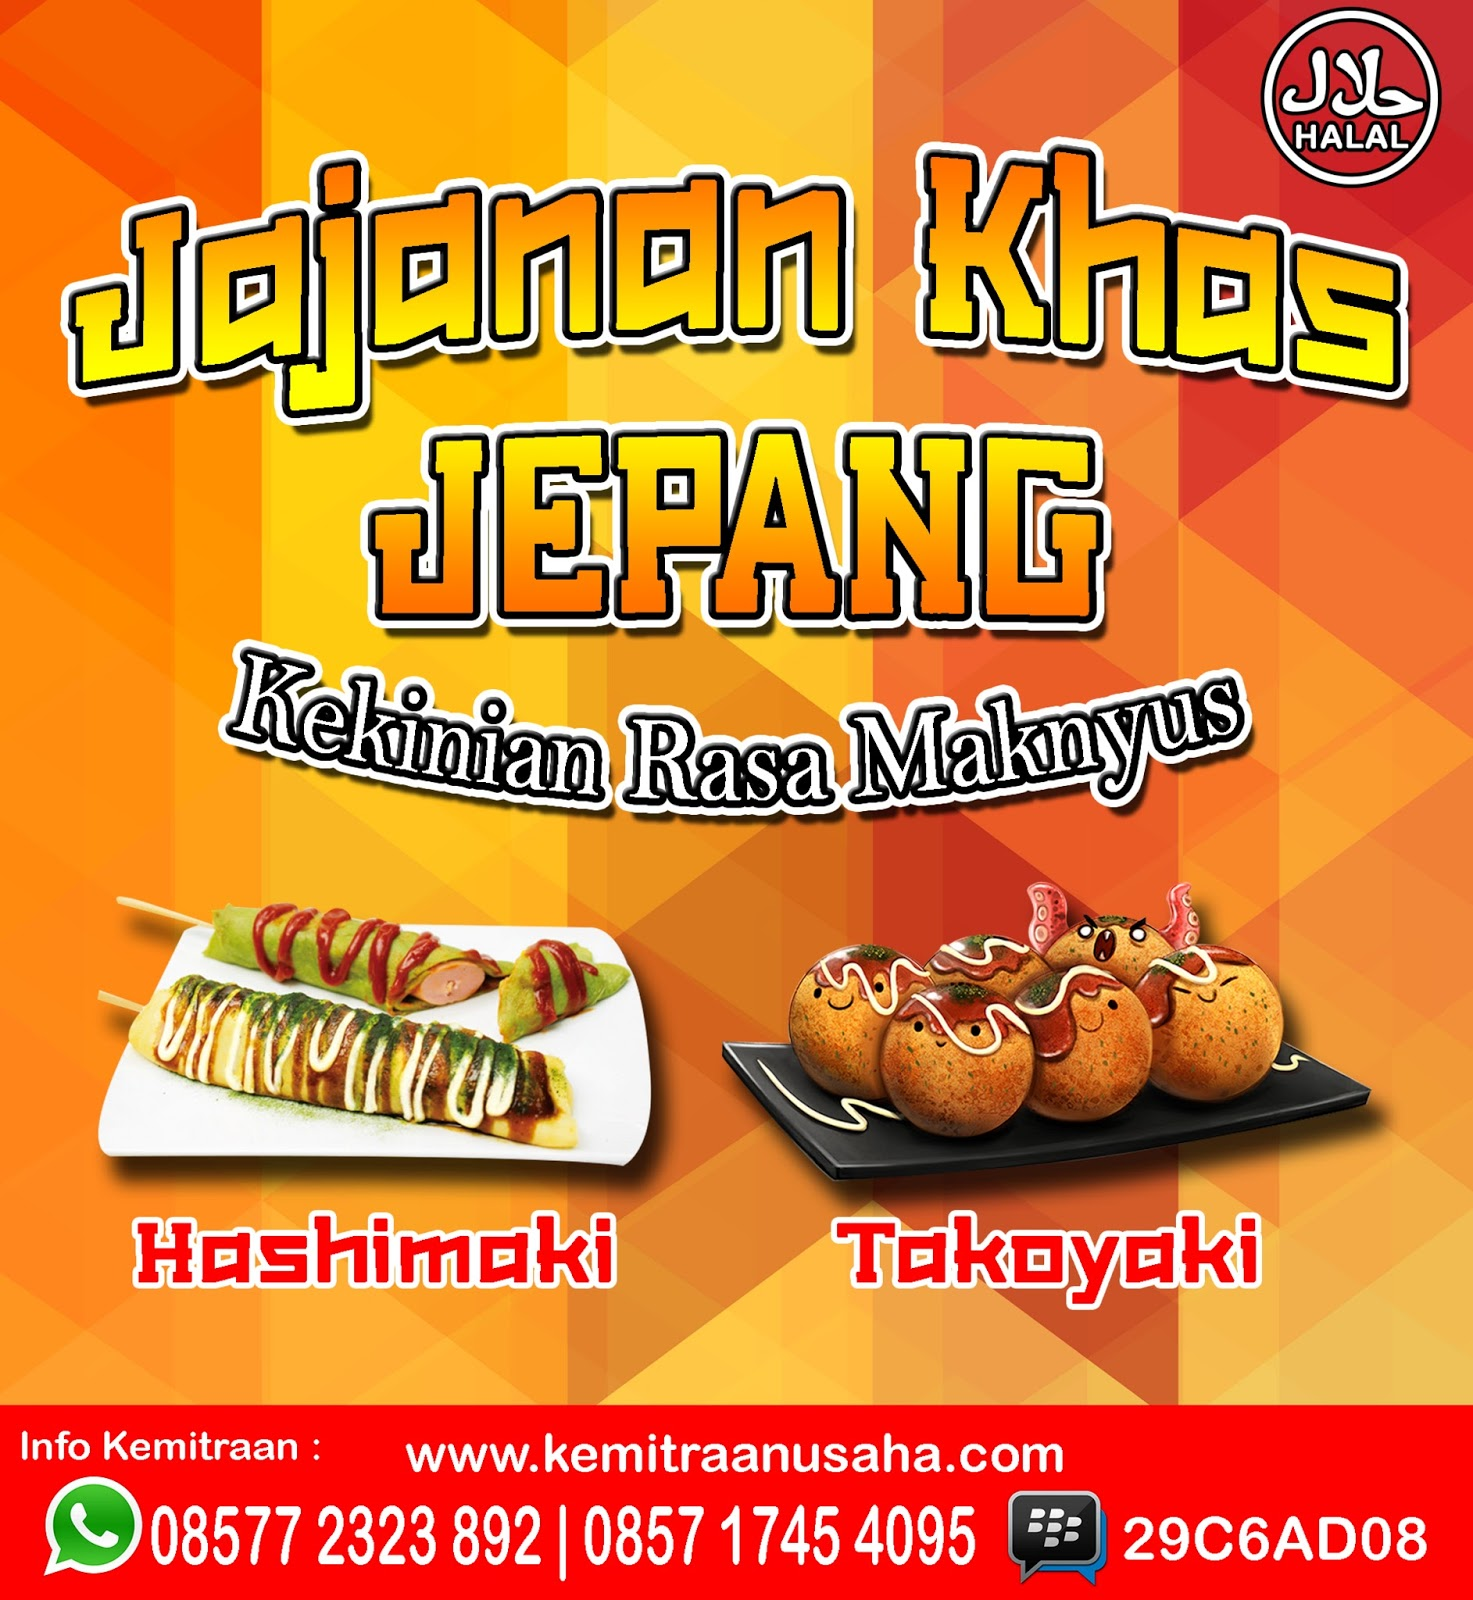 Contoh Banner Makanan Takoyaki - gambar spanduk